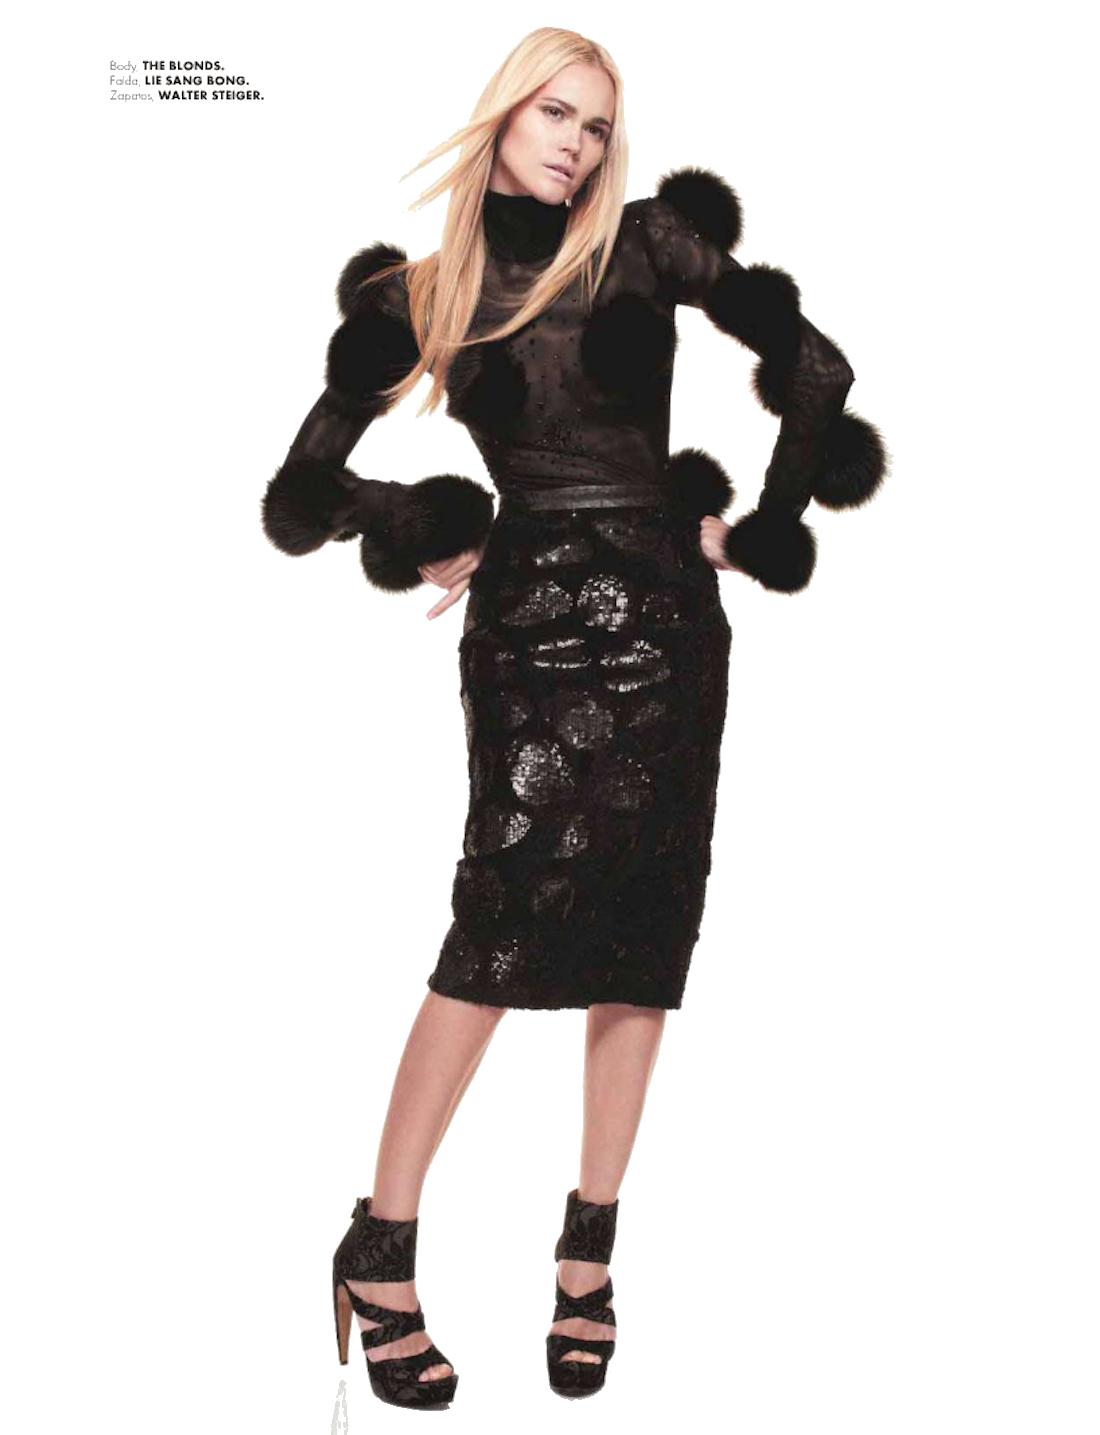 PNG File Name: Fashion Model PlusPng.com  - Model PNG